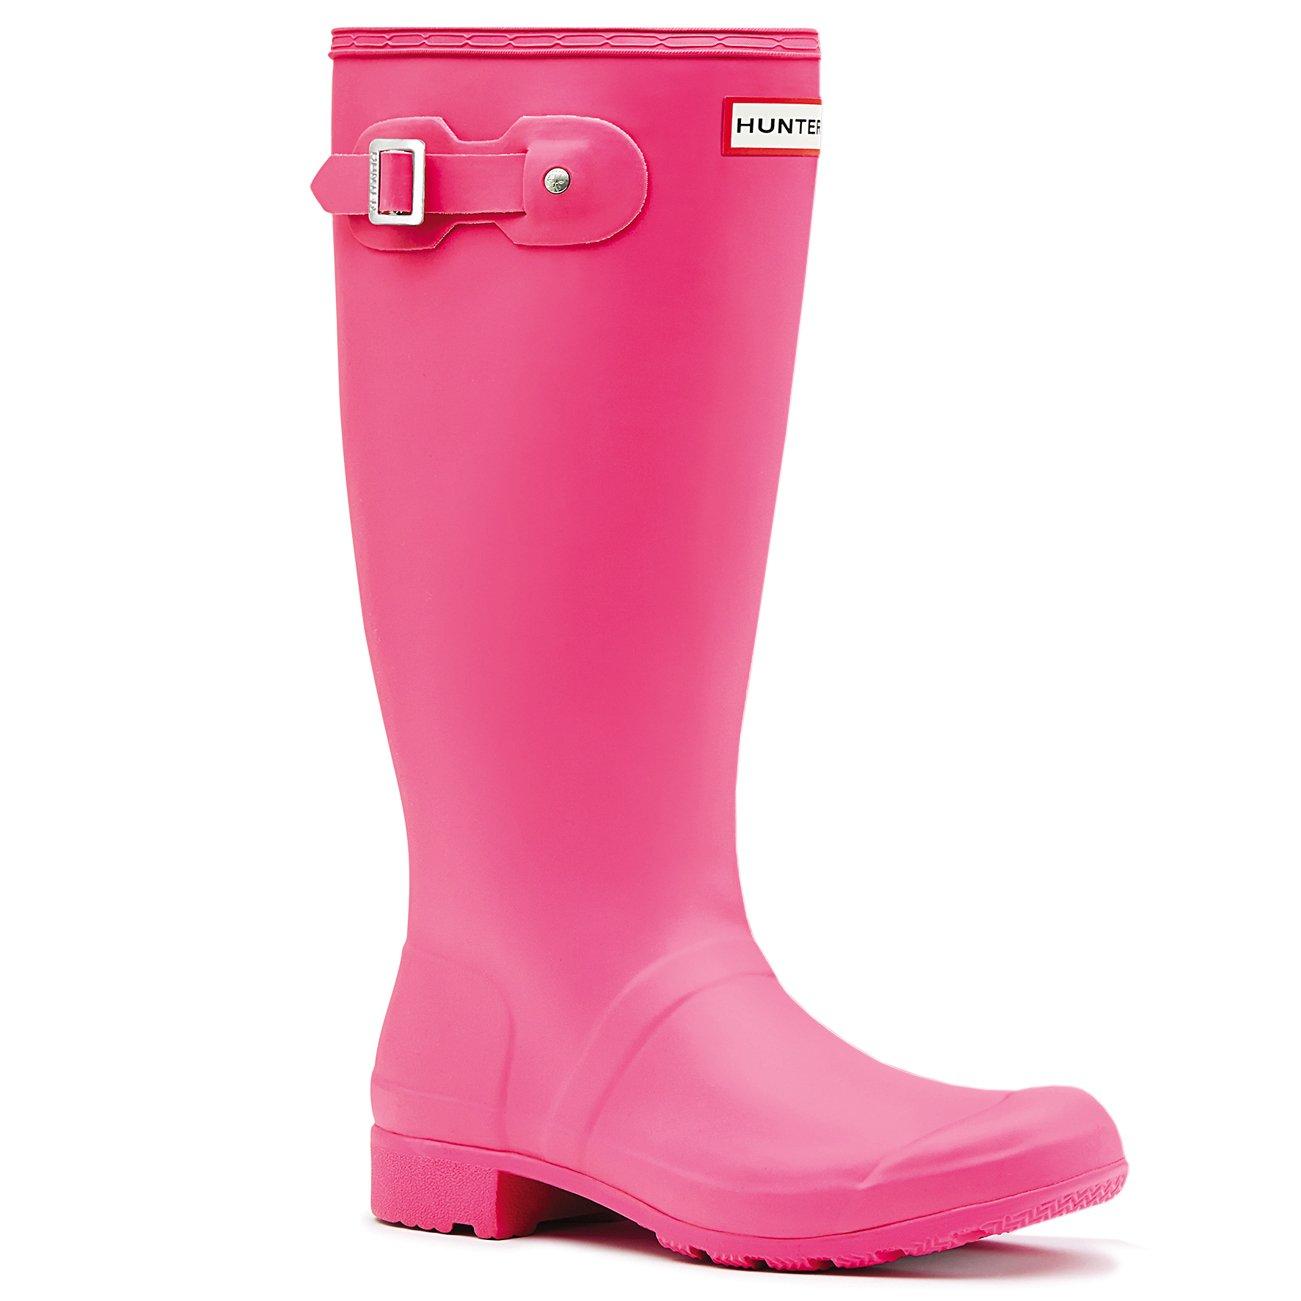 Hunter Womens Original Tour Wellington Winter Muck Galoshes Snow Boots - Bright Cerise - 8